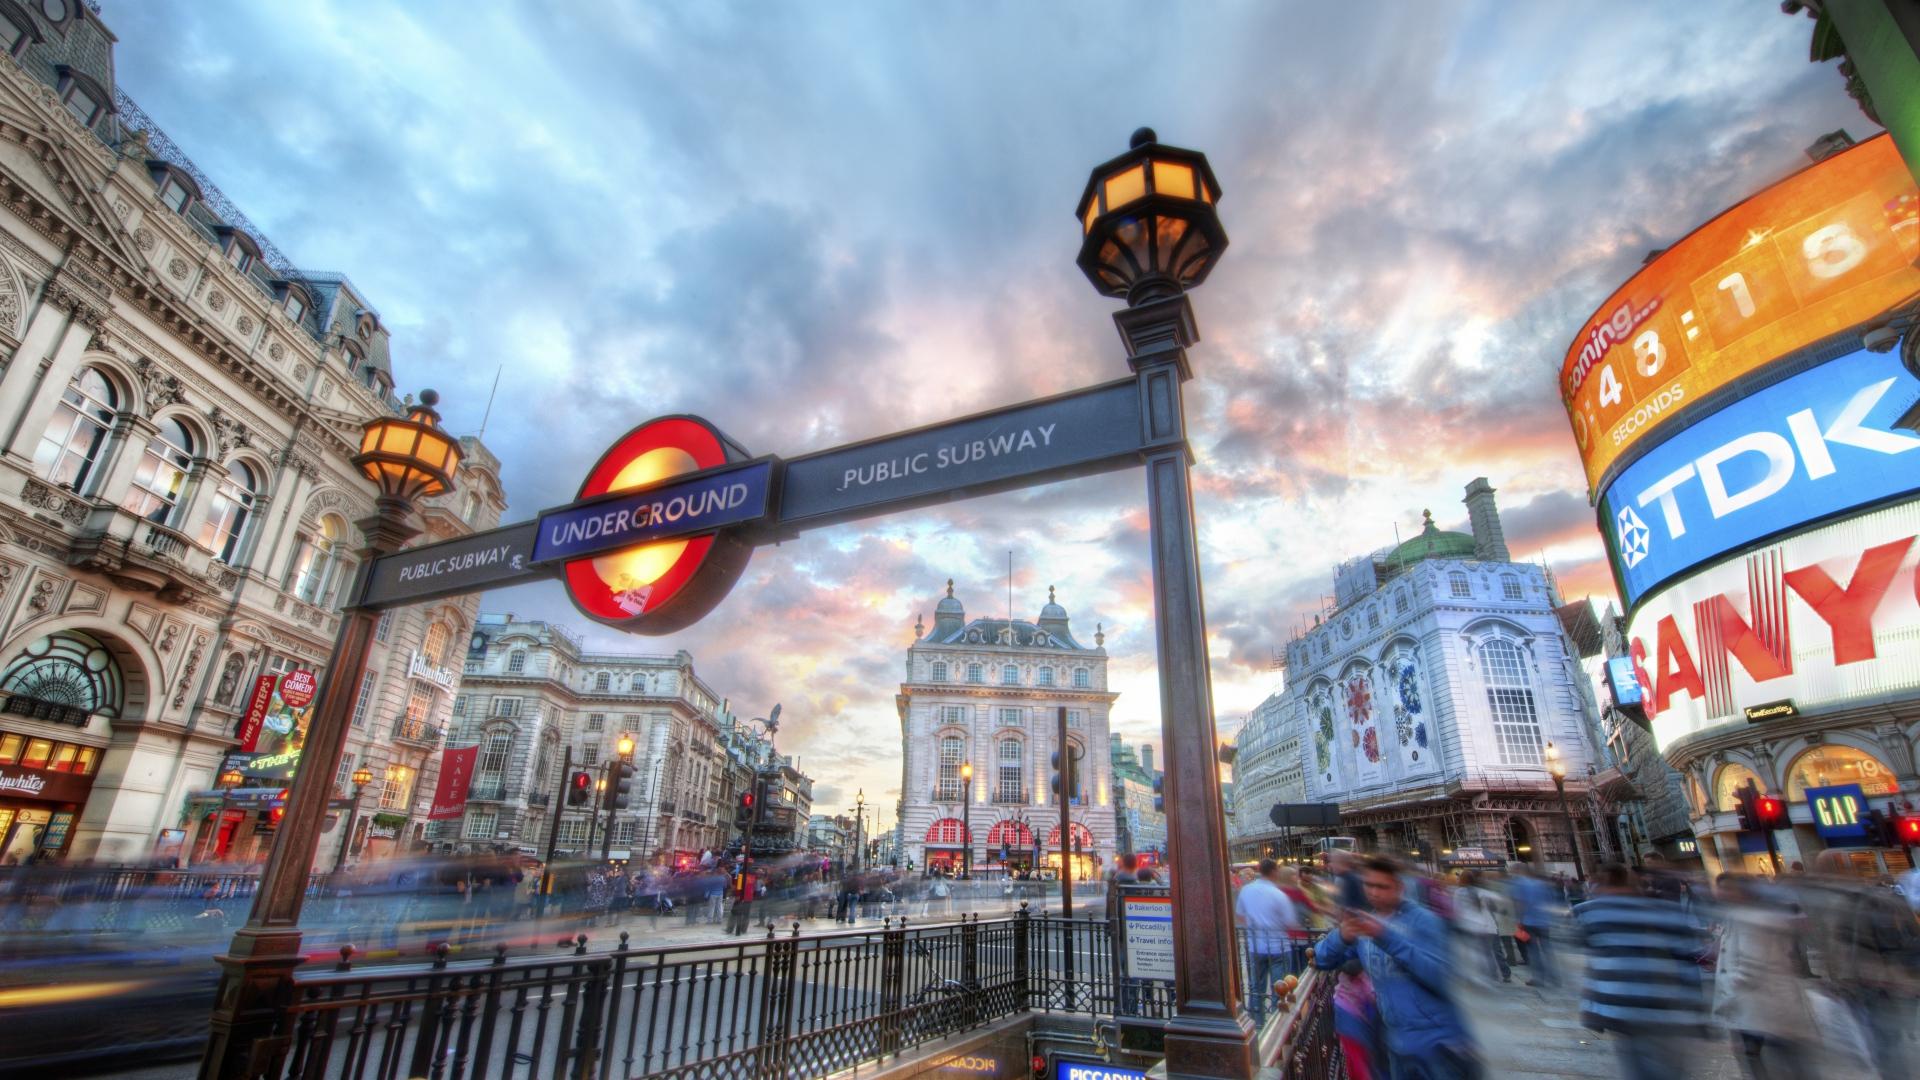 Beautiful Wallpaper Macbook London - World___England_Street_in_London_058578_  Image_18912.jpg